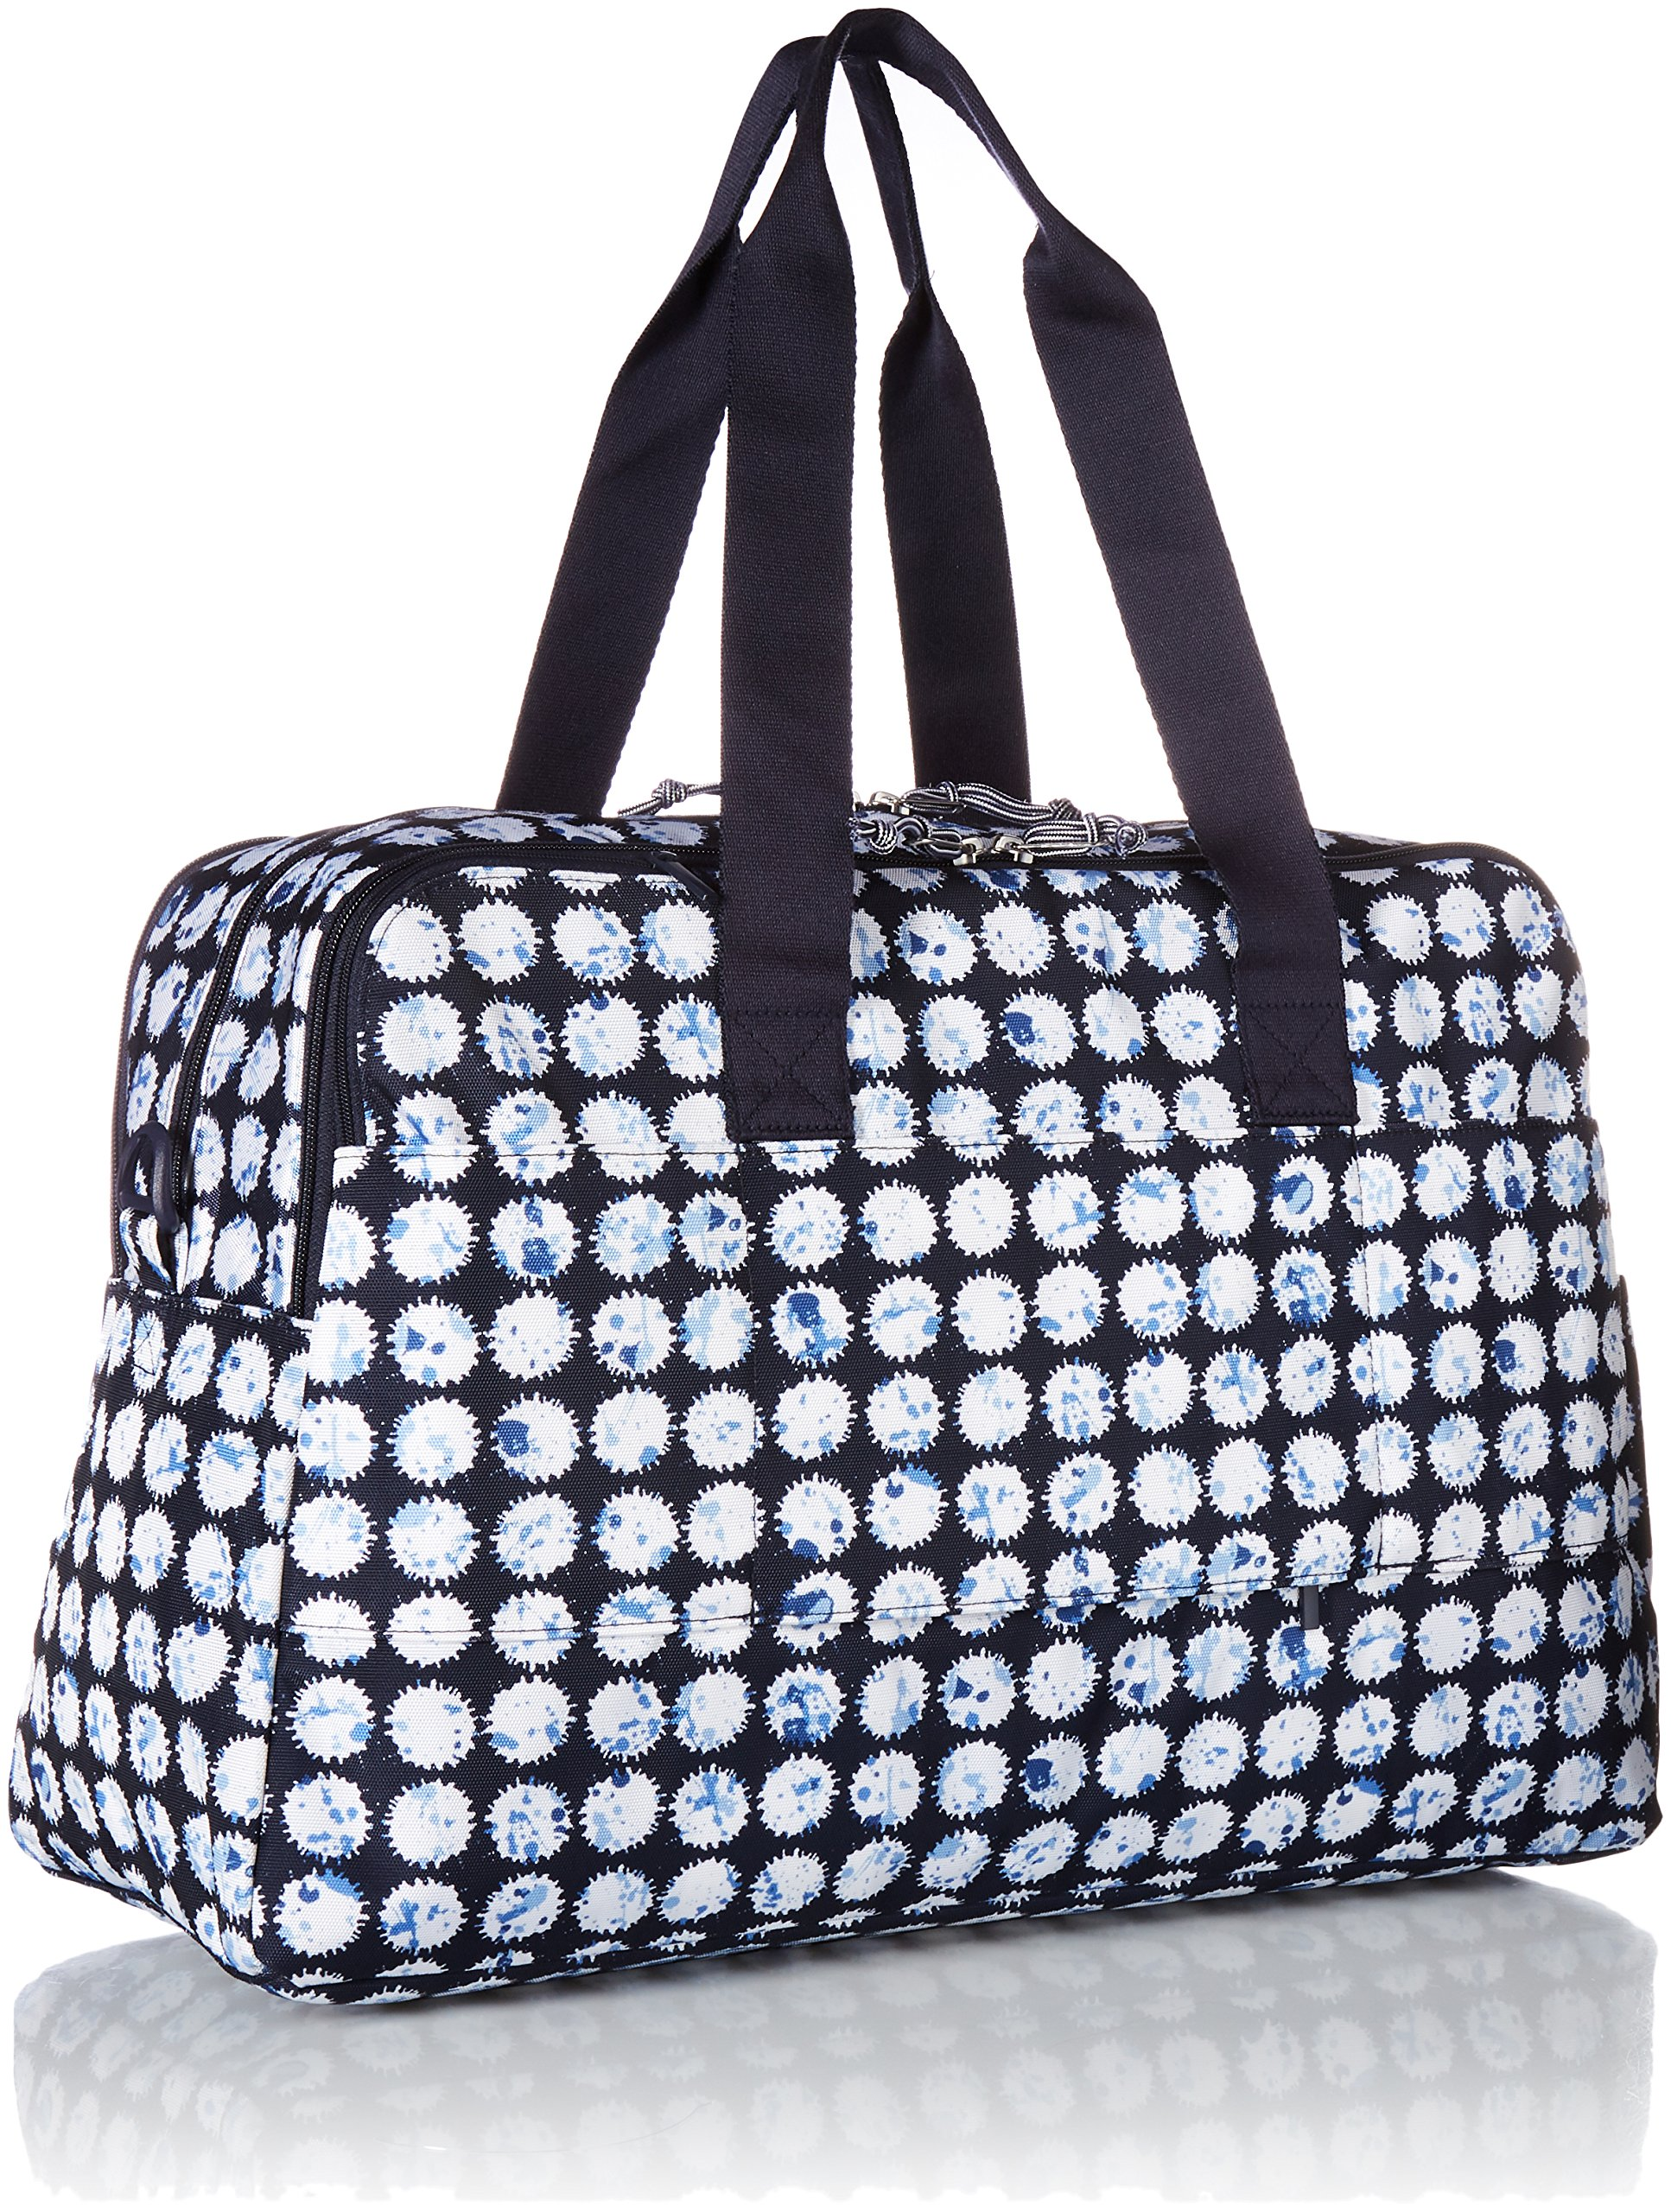 Vera Bradley Lighten up Weekender Travel Bag, Polyester, Splash Dot by Vera Bradley (Image #2)